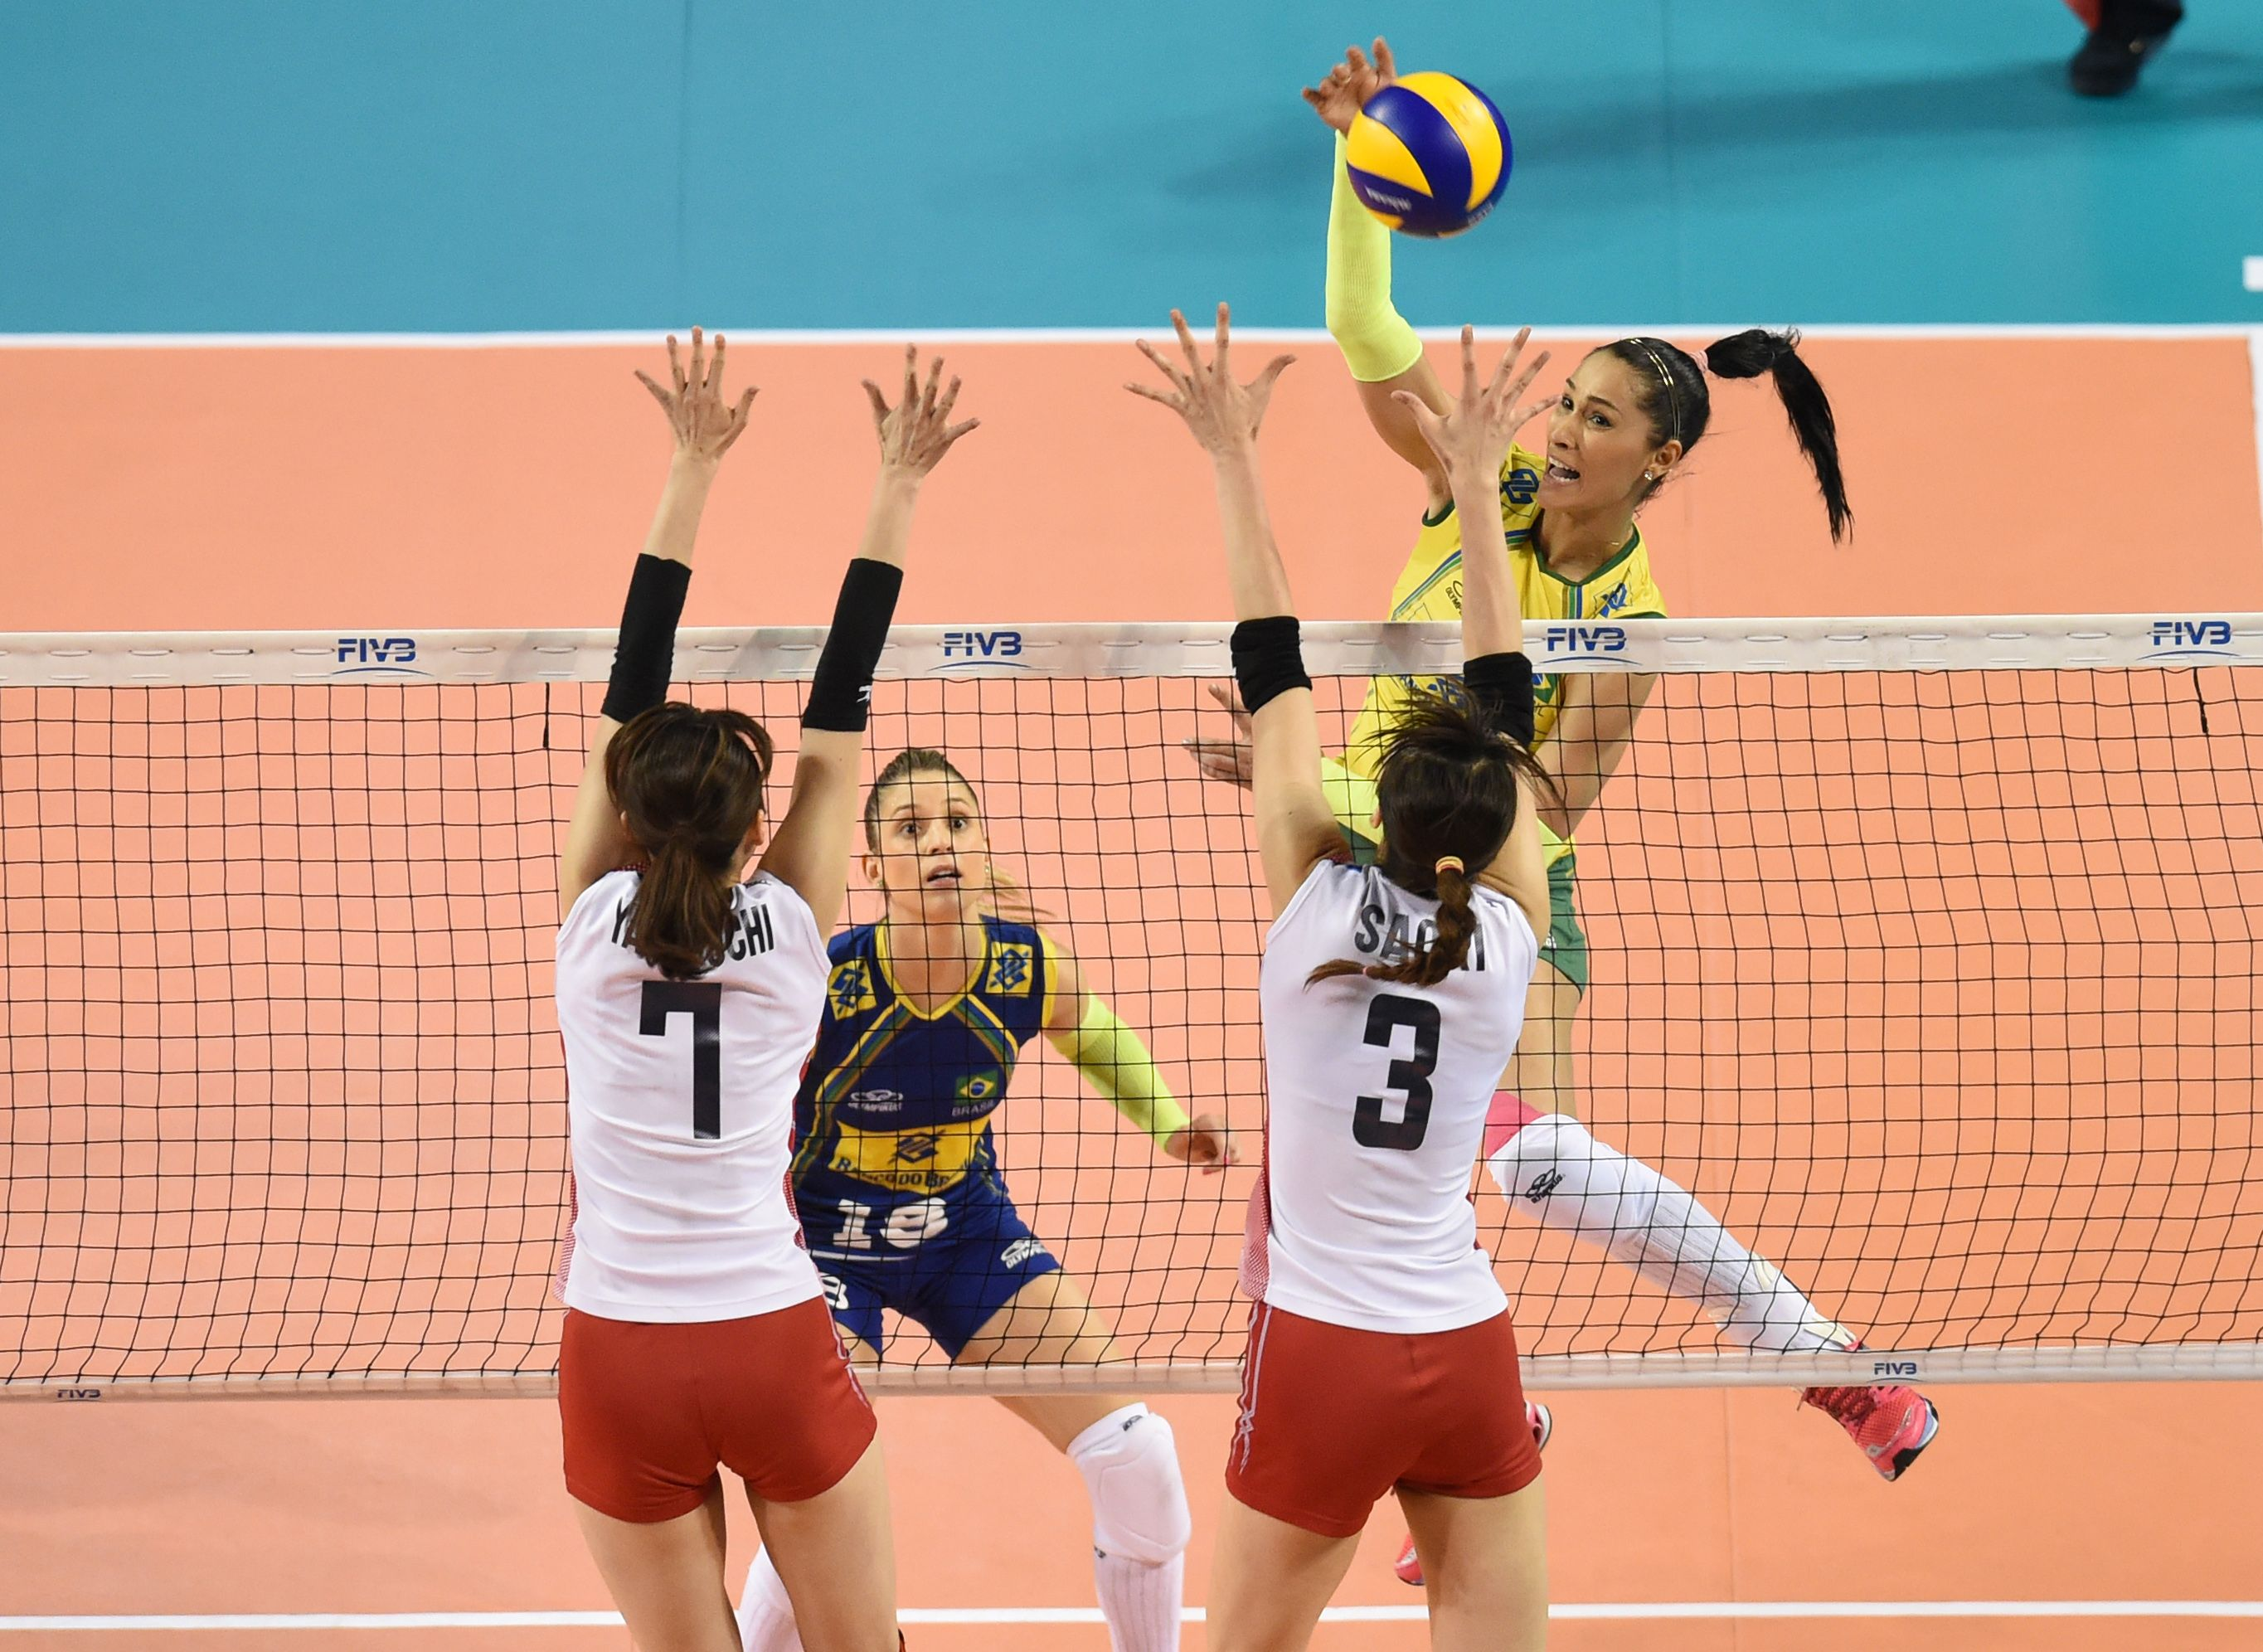 Jaqueline Pereira De Carvalho Endres Of Brazil Spikes The Ball Pereira Tall Women Ball